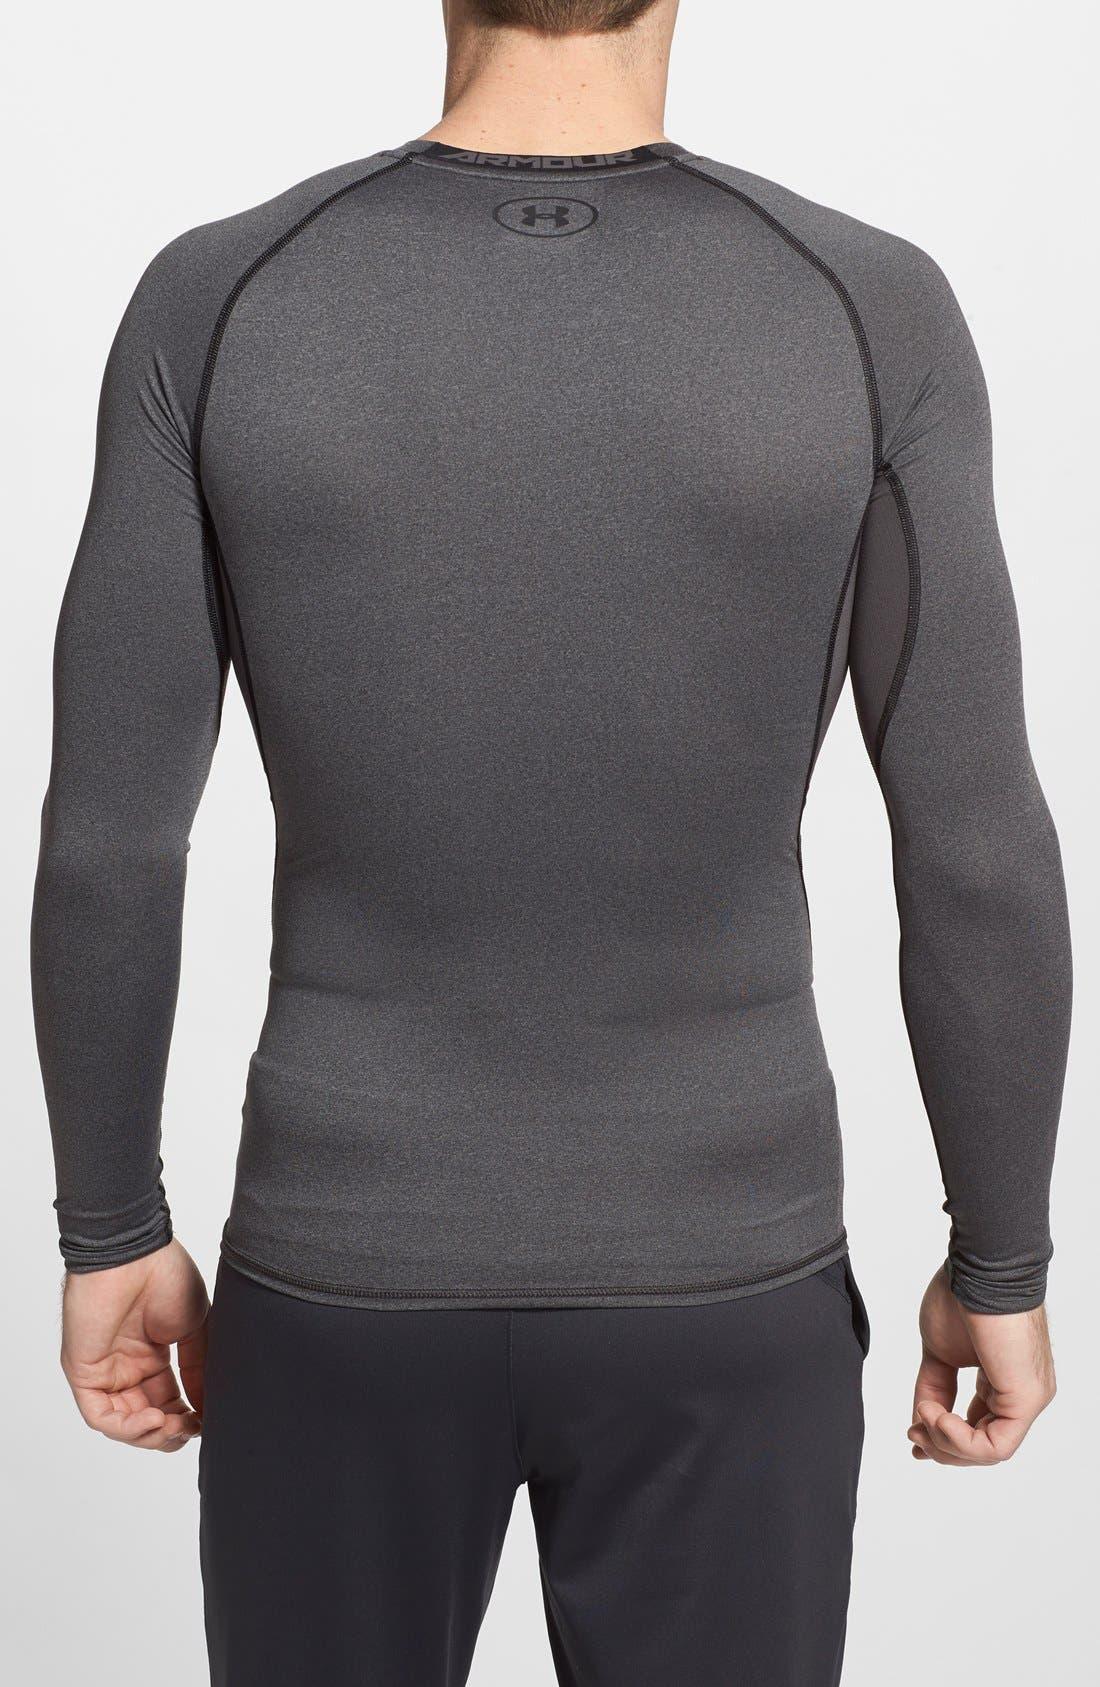 HeatGear<sup>®</sup> Compression Fit Long Sleeve T-Shirt,                             Alternate thumbnail 7, color,                             CARBON HEATHER/ BLACK